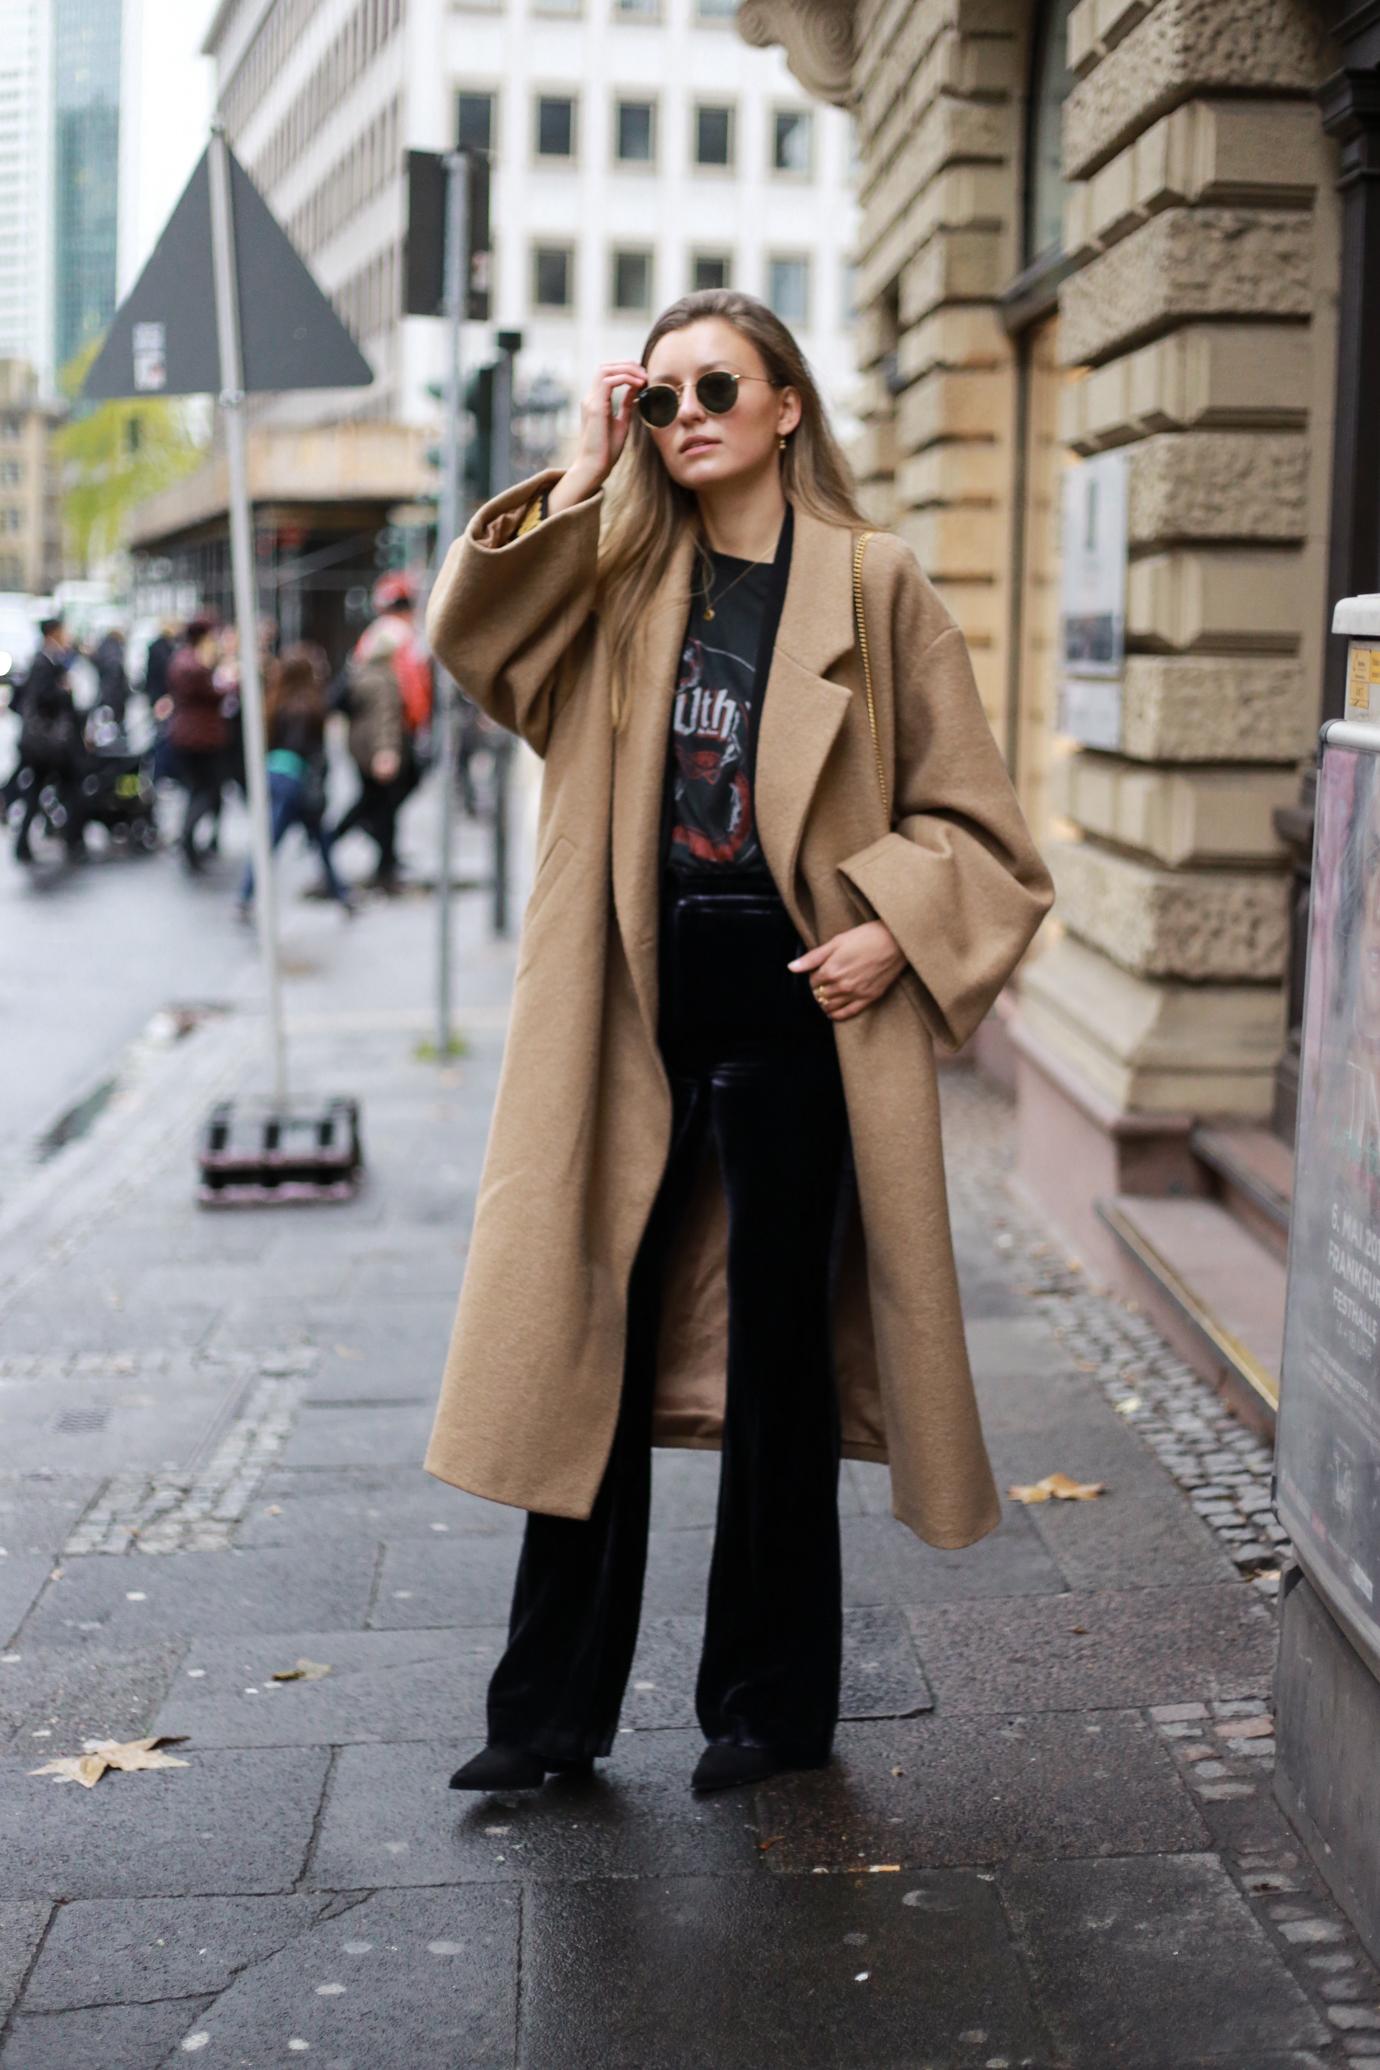 velvet-band-shirt-camel-coat-outfit-livia-auer-6513